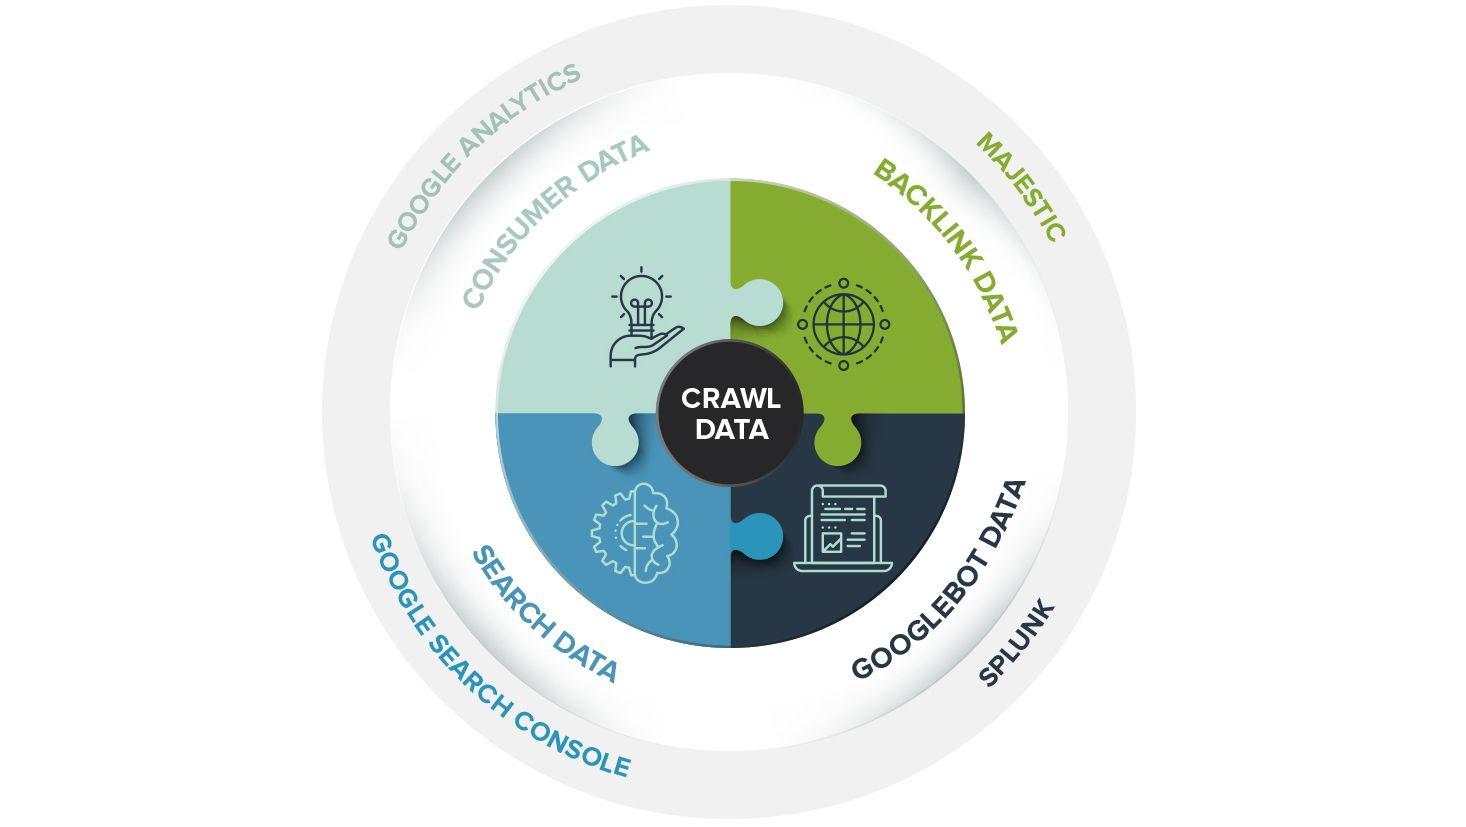 Crawl data sources